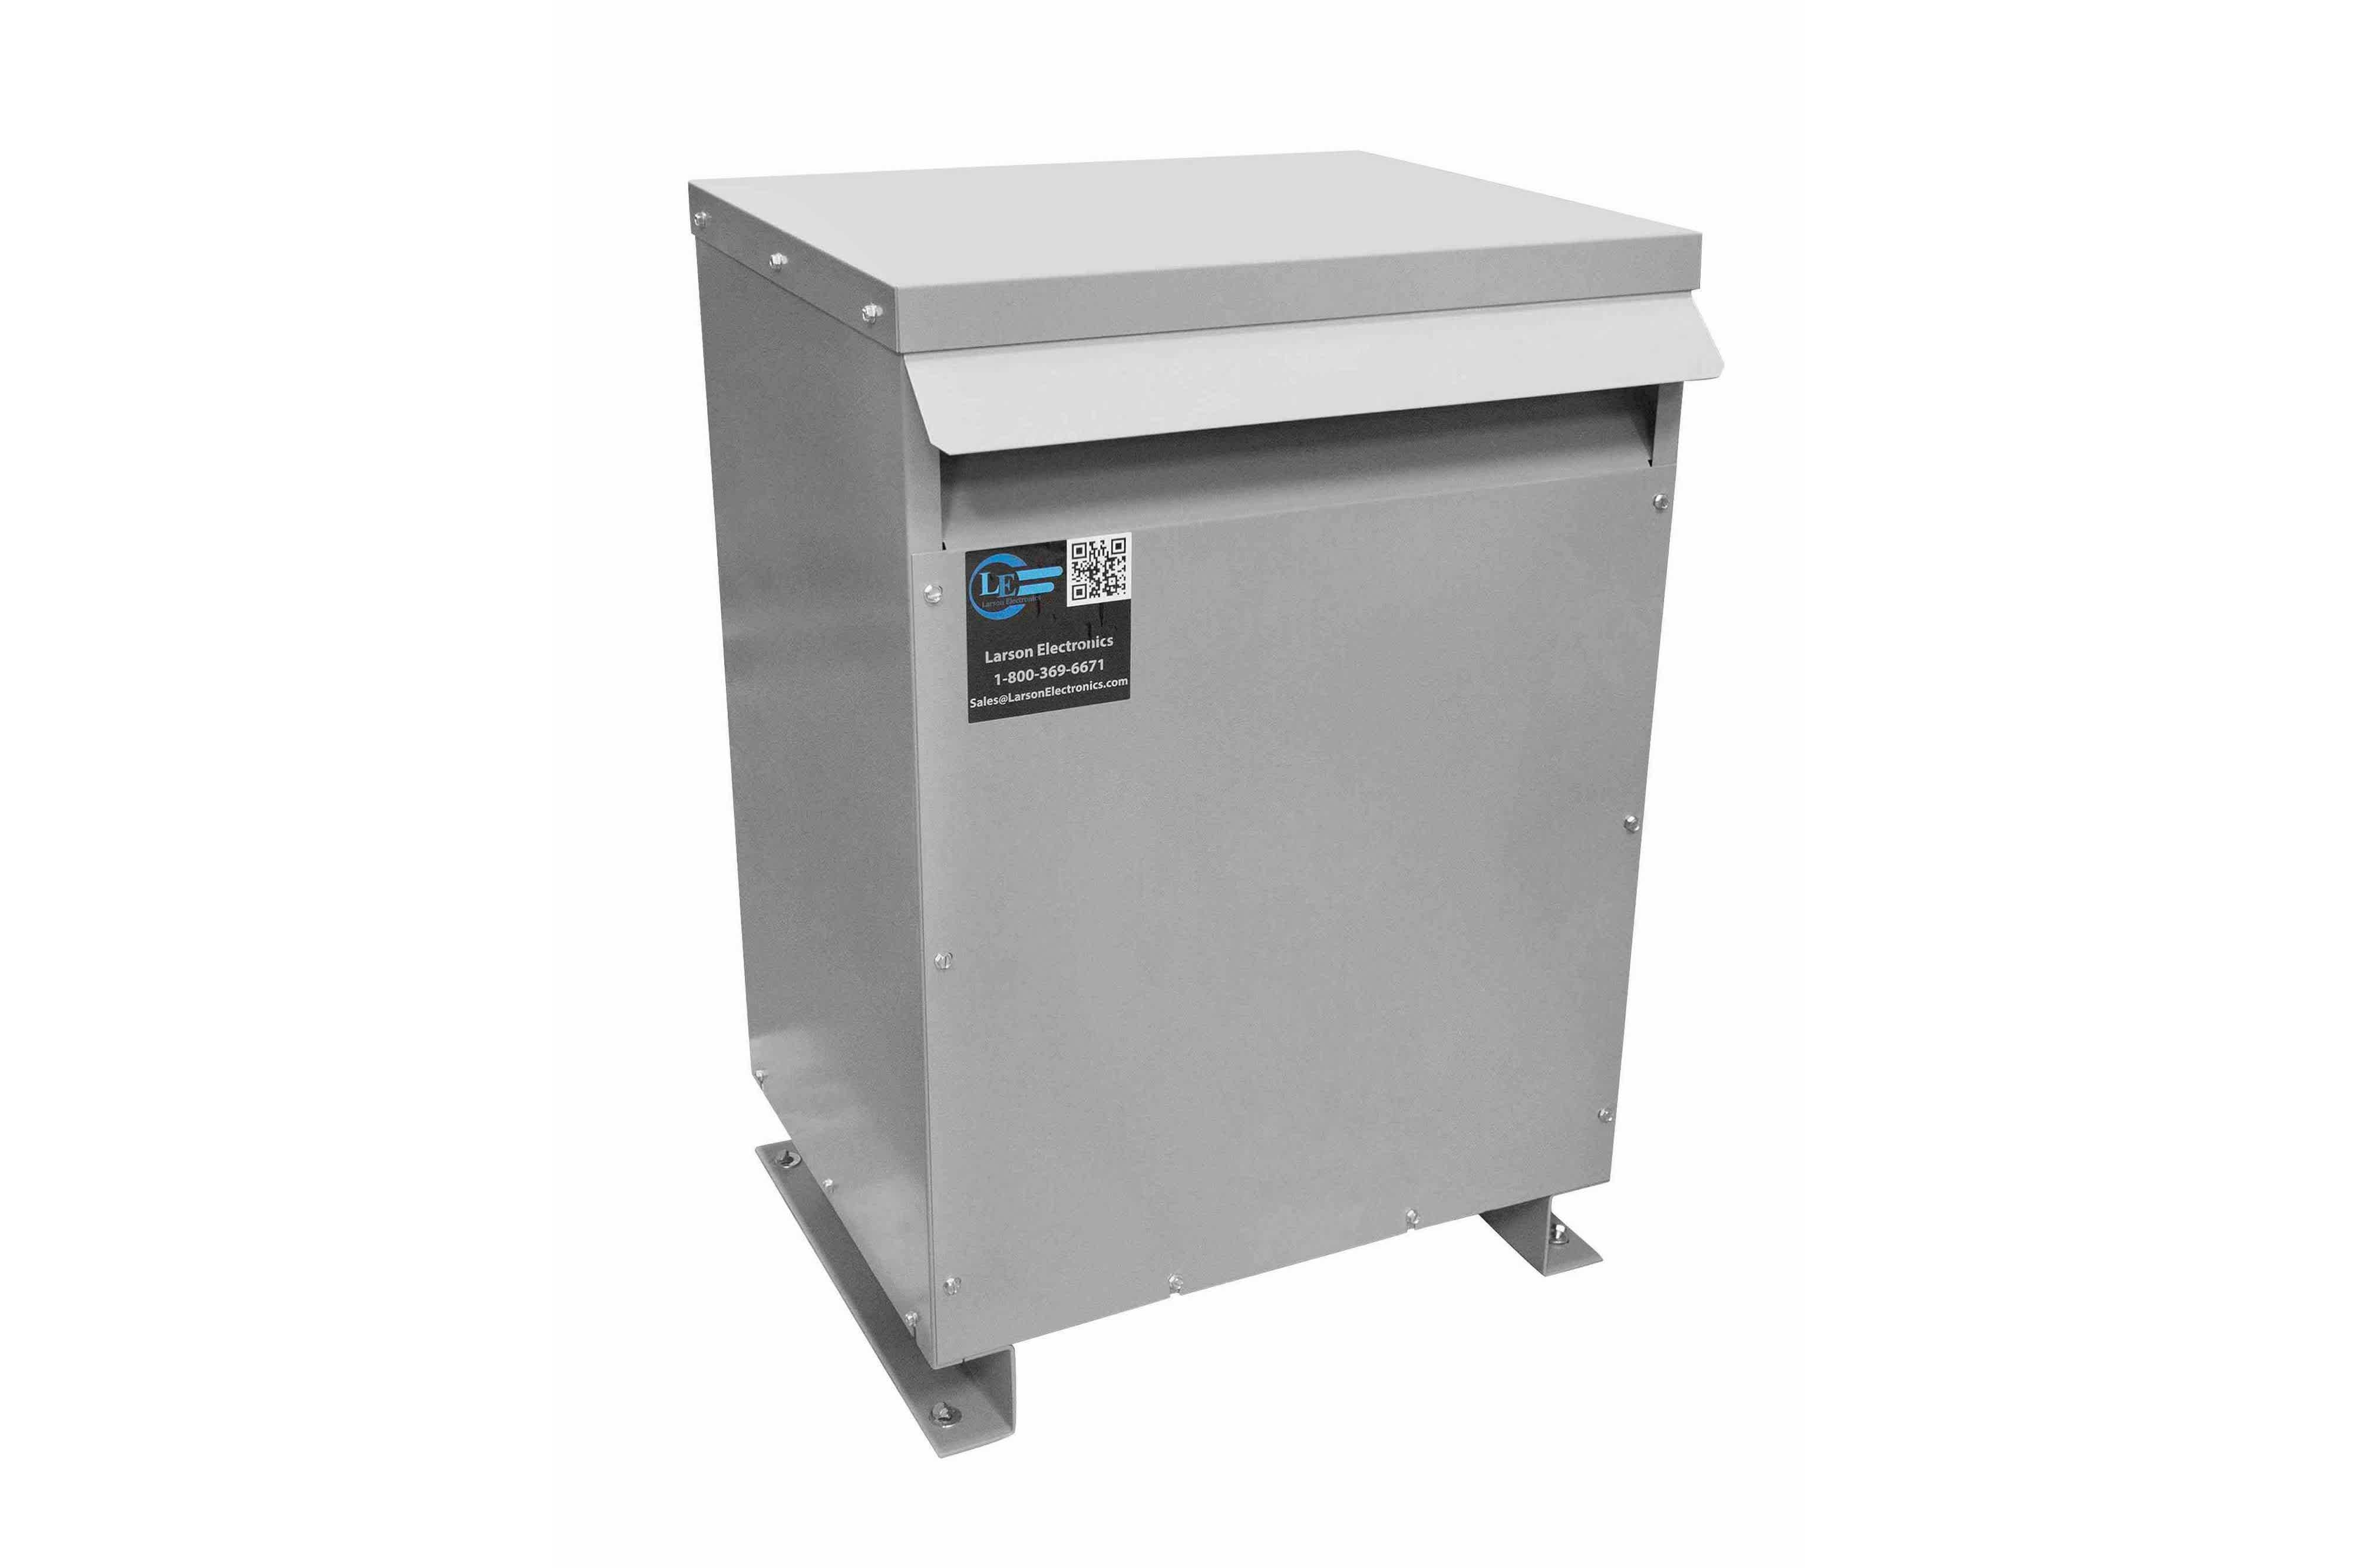 37.5 kVA 3PH Isolation Transformer, 575V Wye Primary, 380Y/220 Wye-N Secondary, N3R, Ventilated, 60 Hz